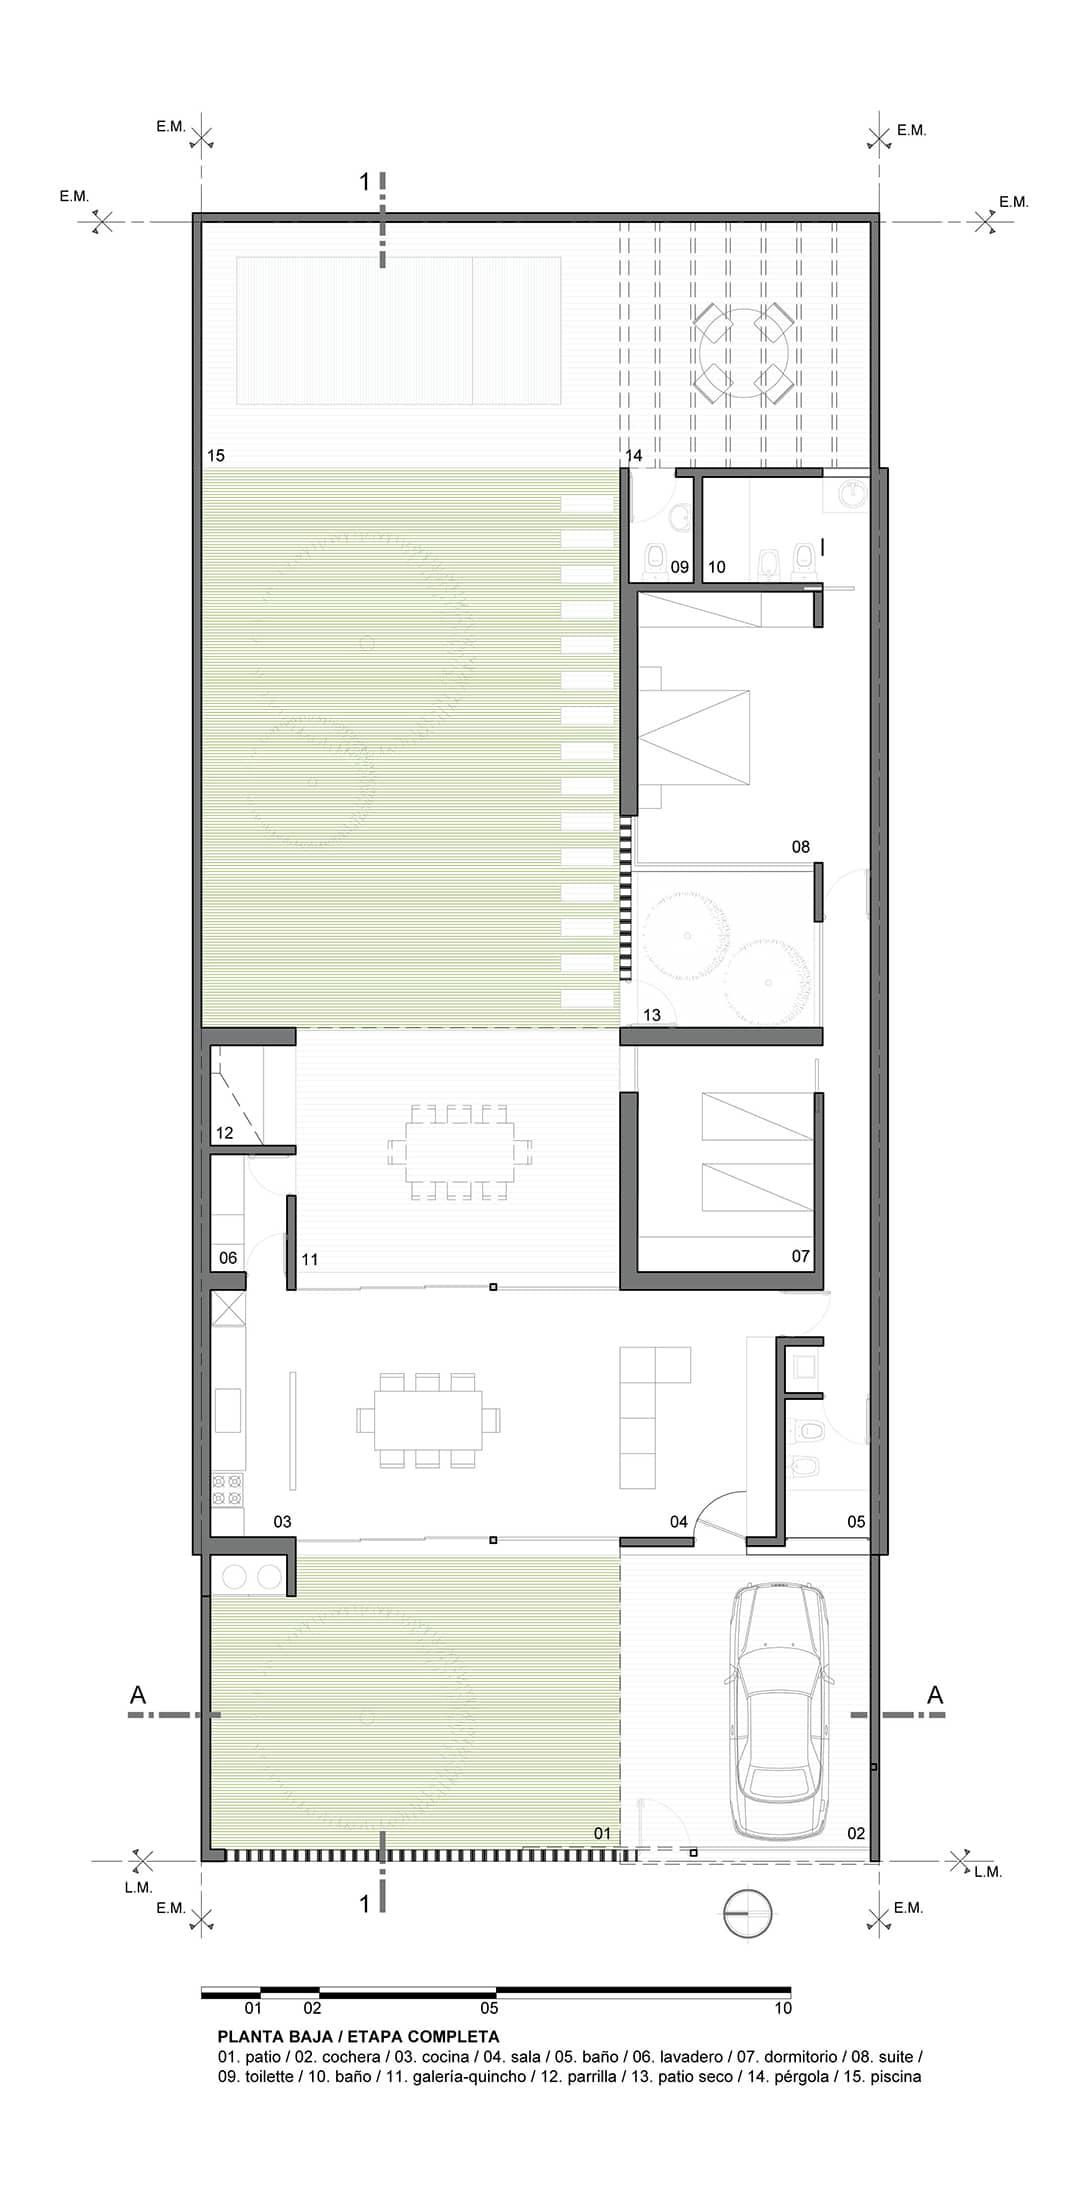 Planos de casas de un piso 3 dormitorios planos de casas for Planos de casas de un piso